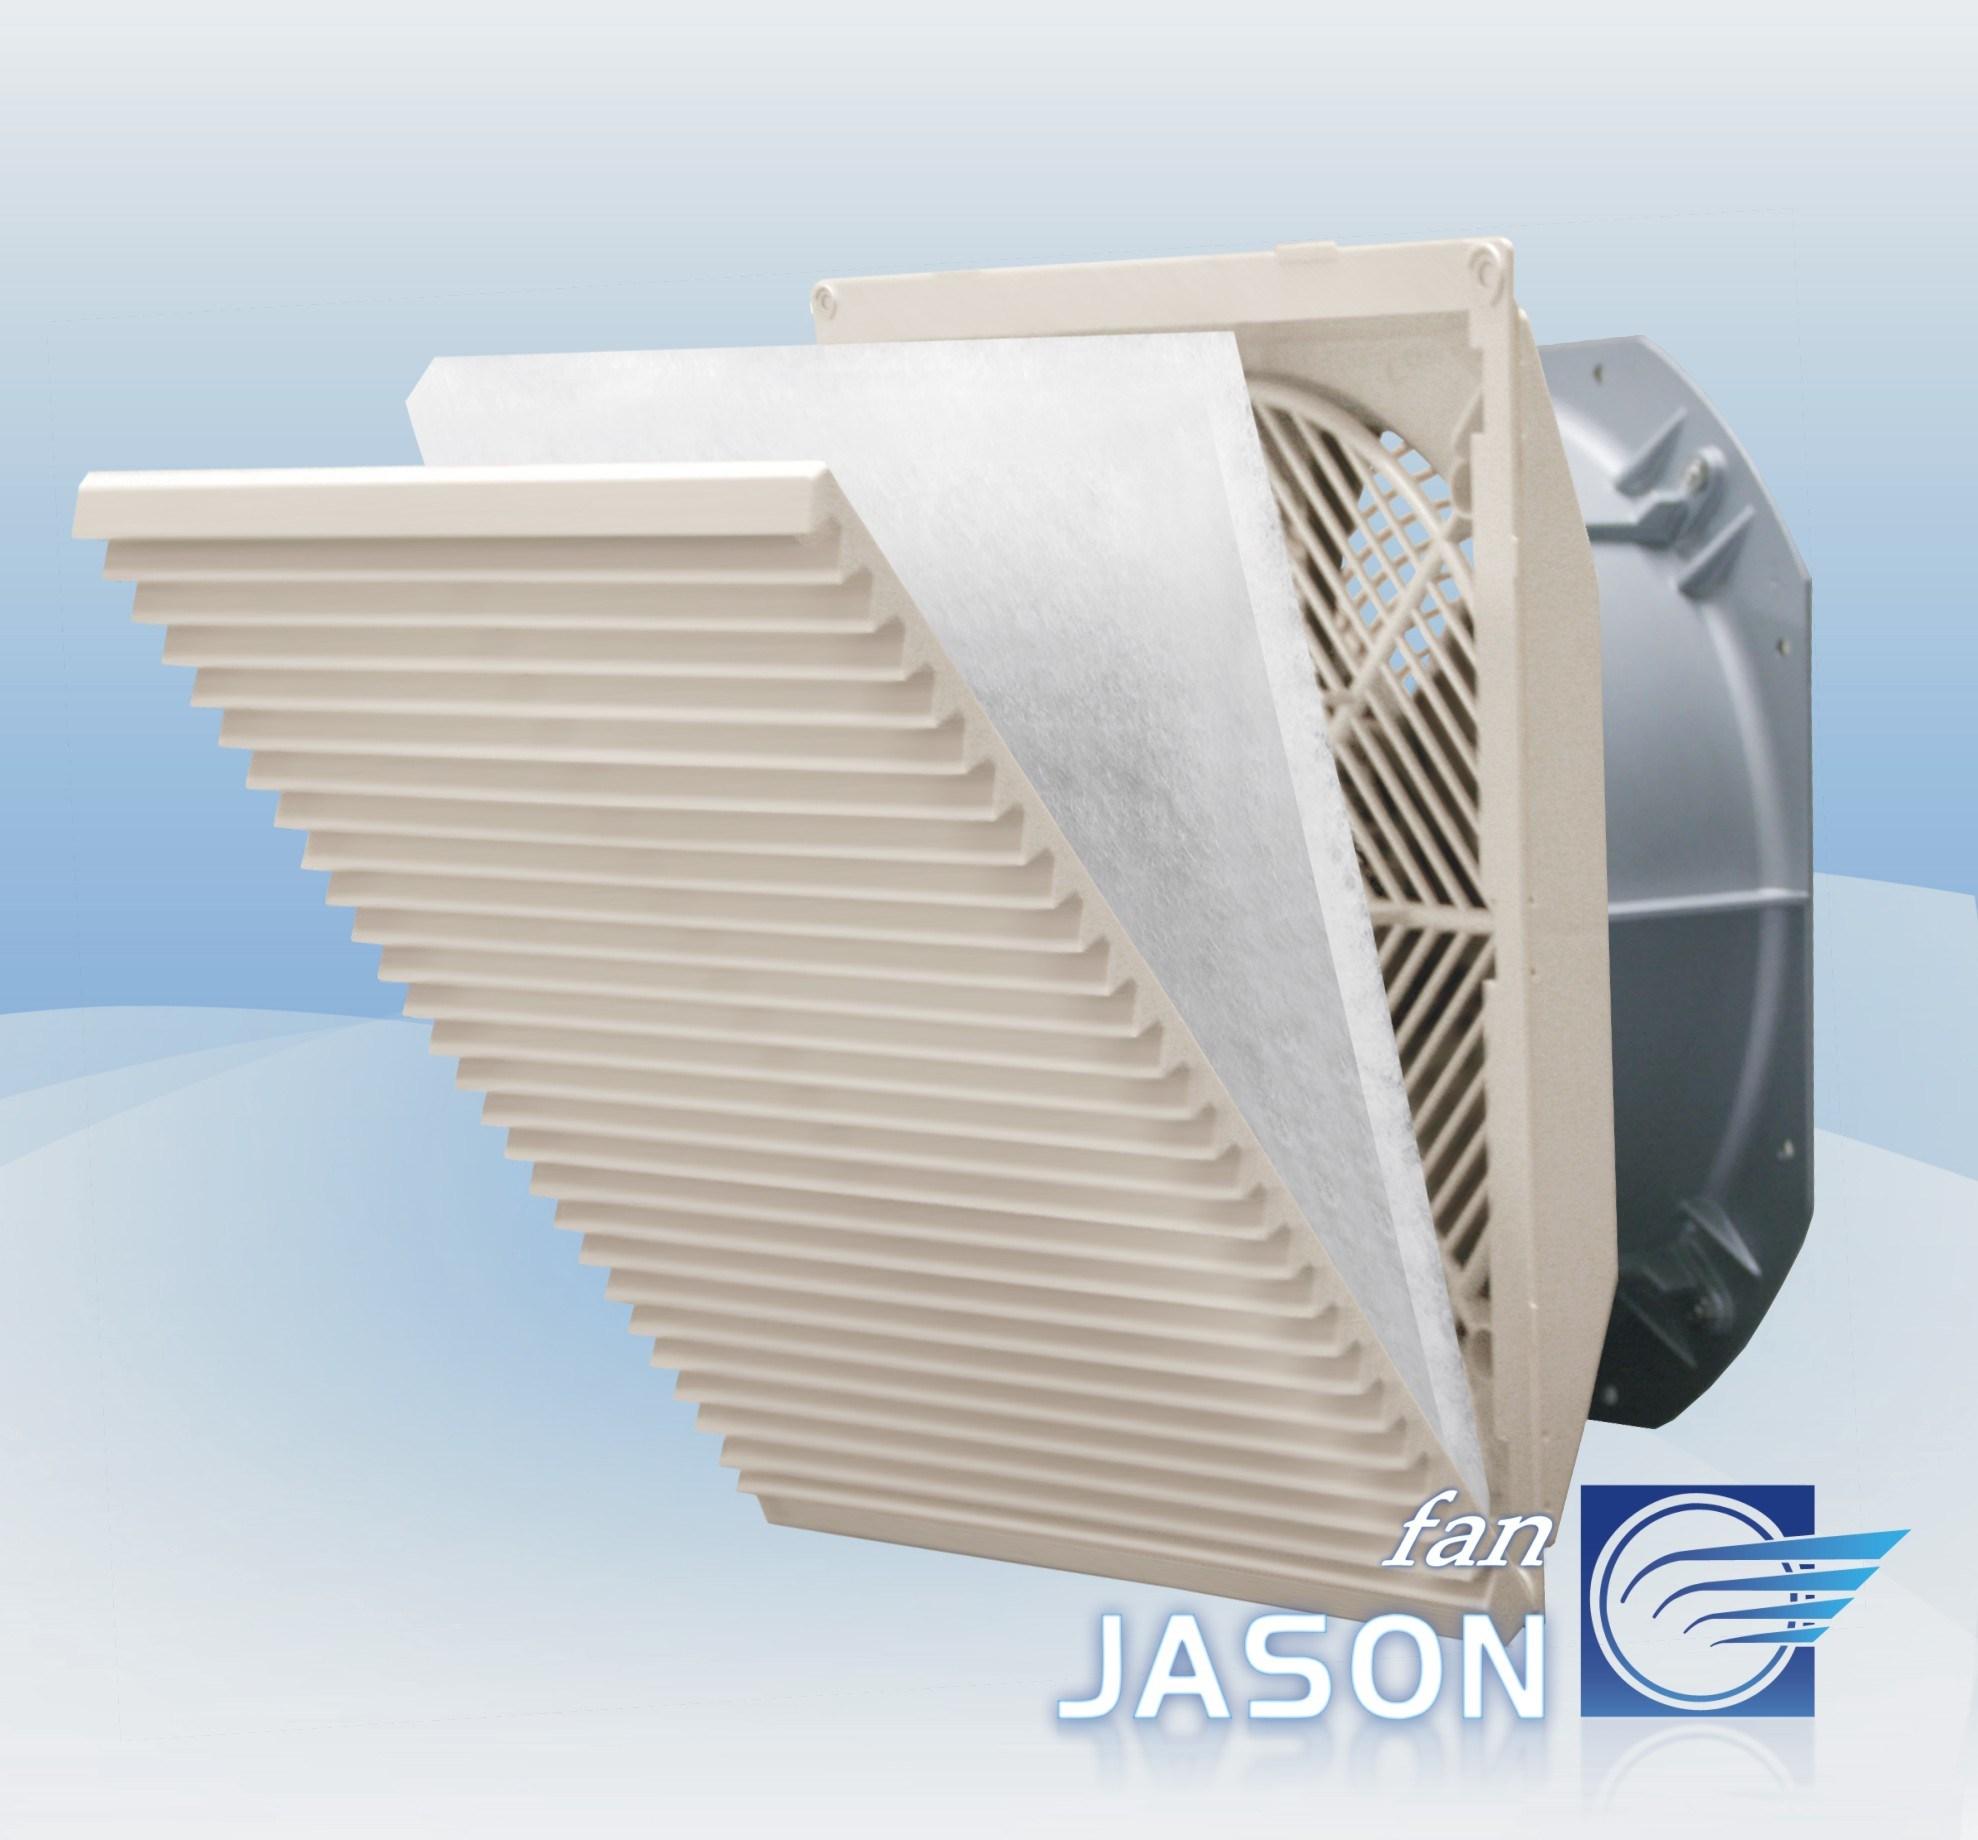 Ventilador de ventilação industrial elevado do fluxo de ar (FJK6626D  #2F6B9C